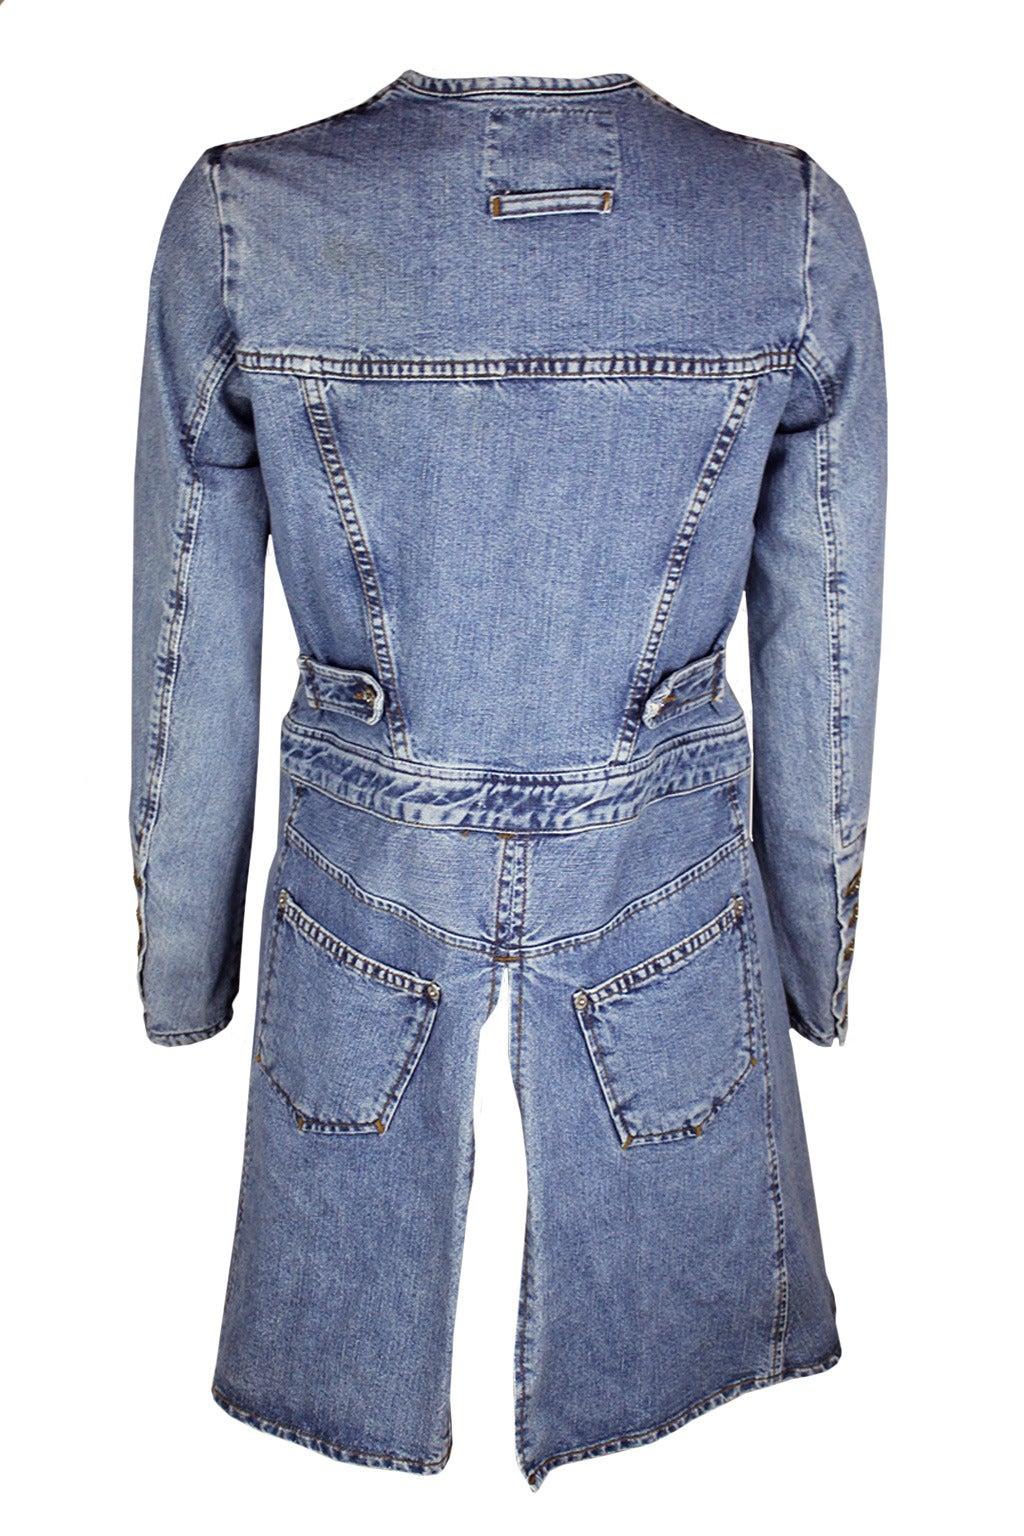 Jean Paul Gaultier Jeans Deconstructed Denim Jacket At 1stdibs